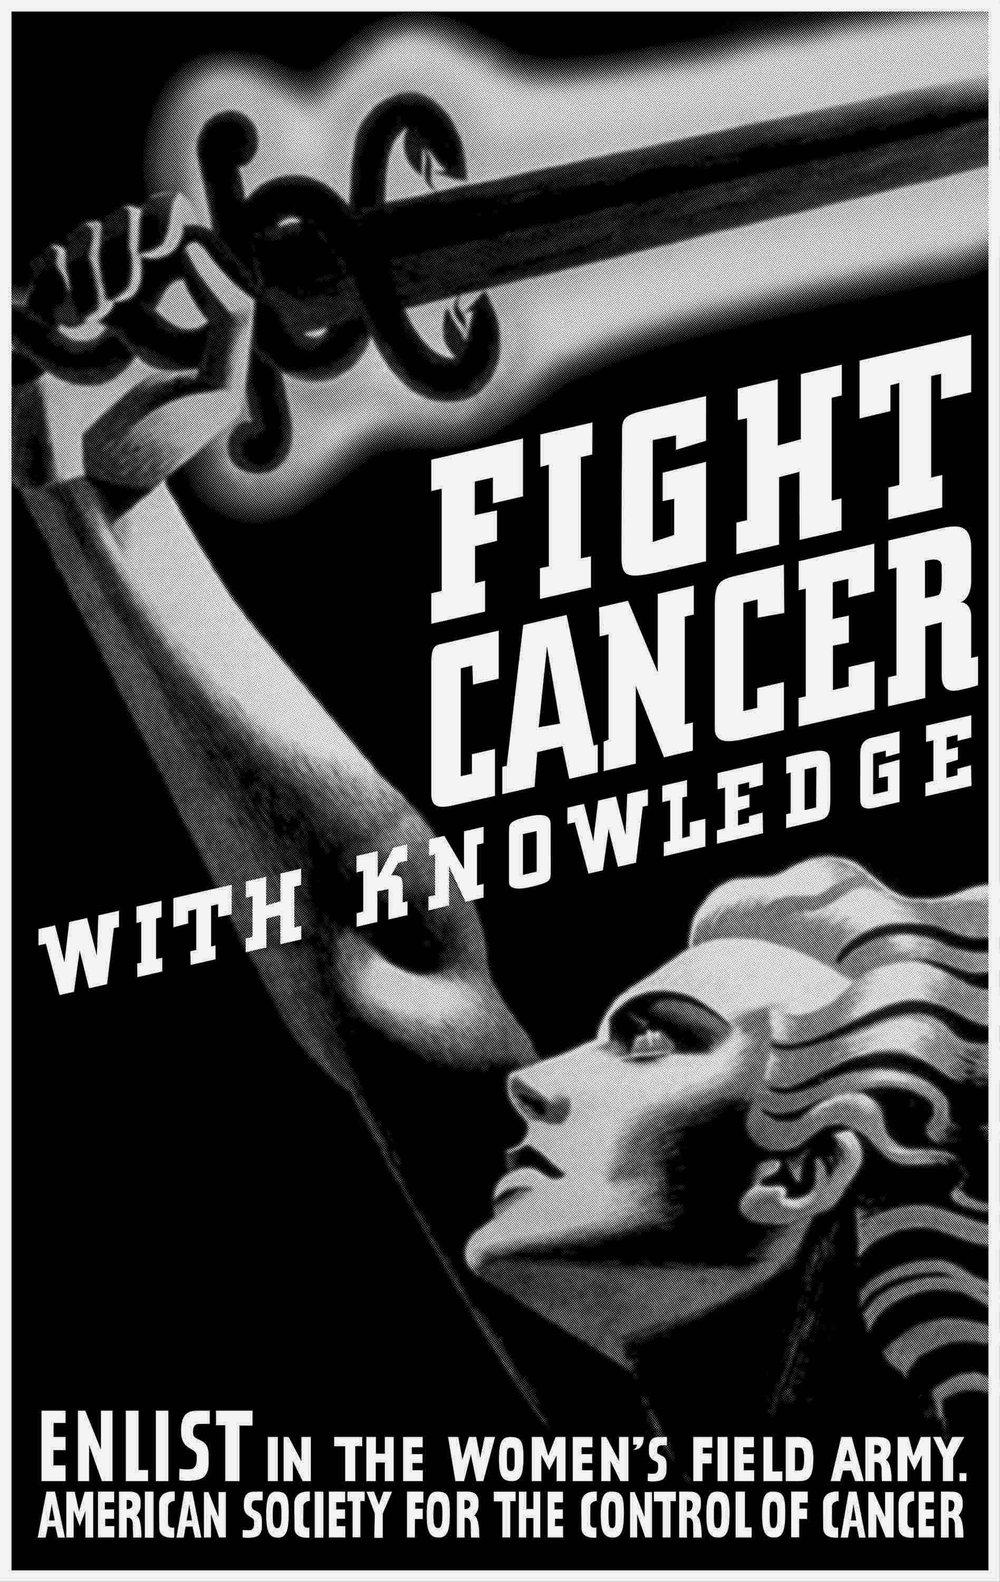 240-cancer-#12-motiv.jpg